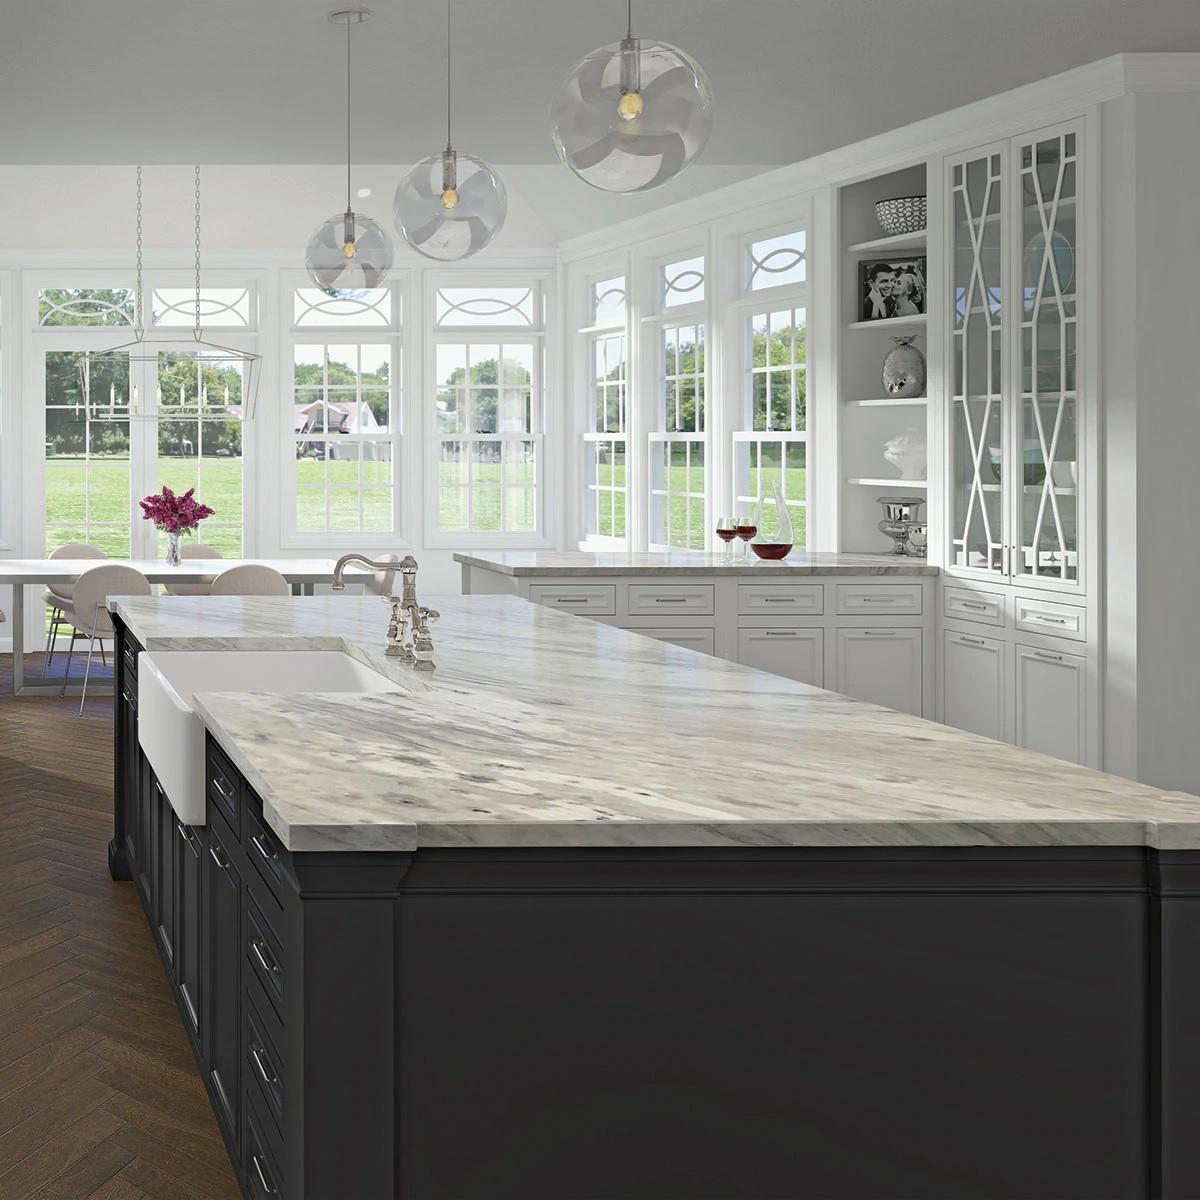 Countertop | Dalton Wholesale Floors